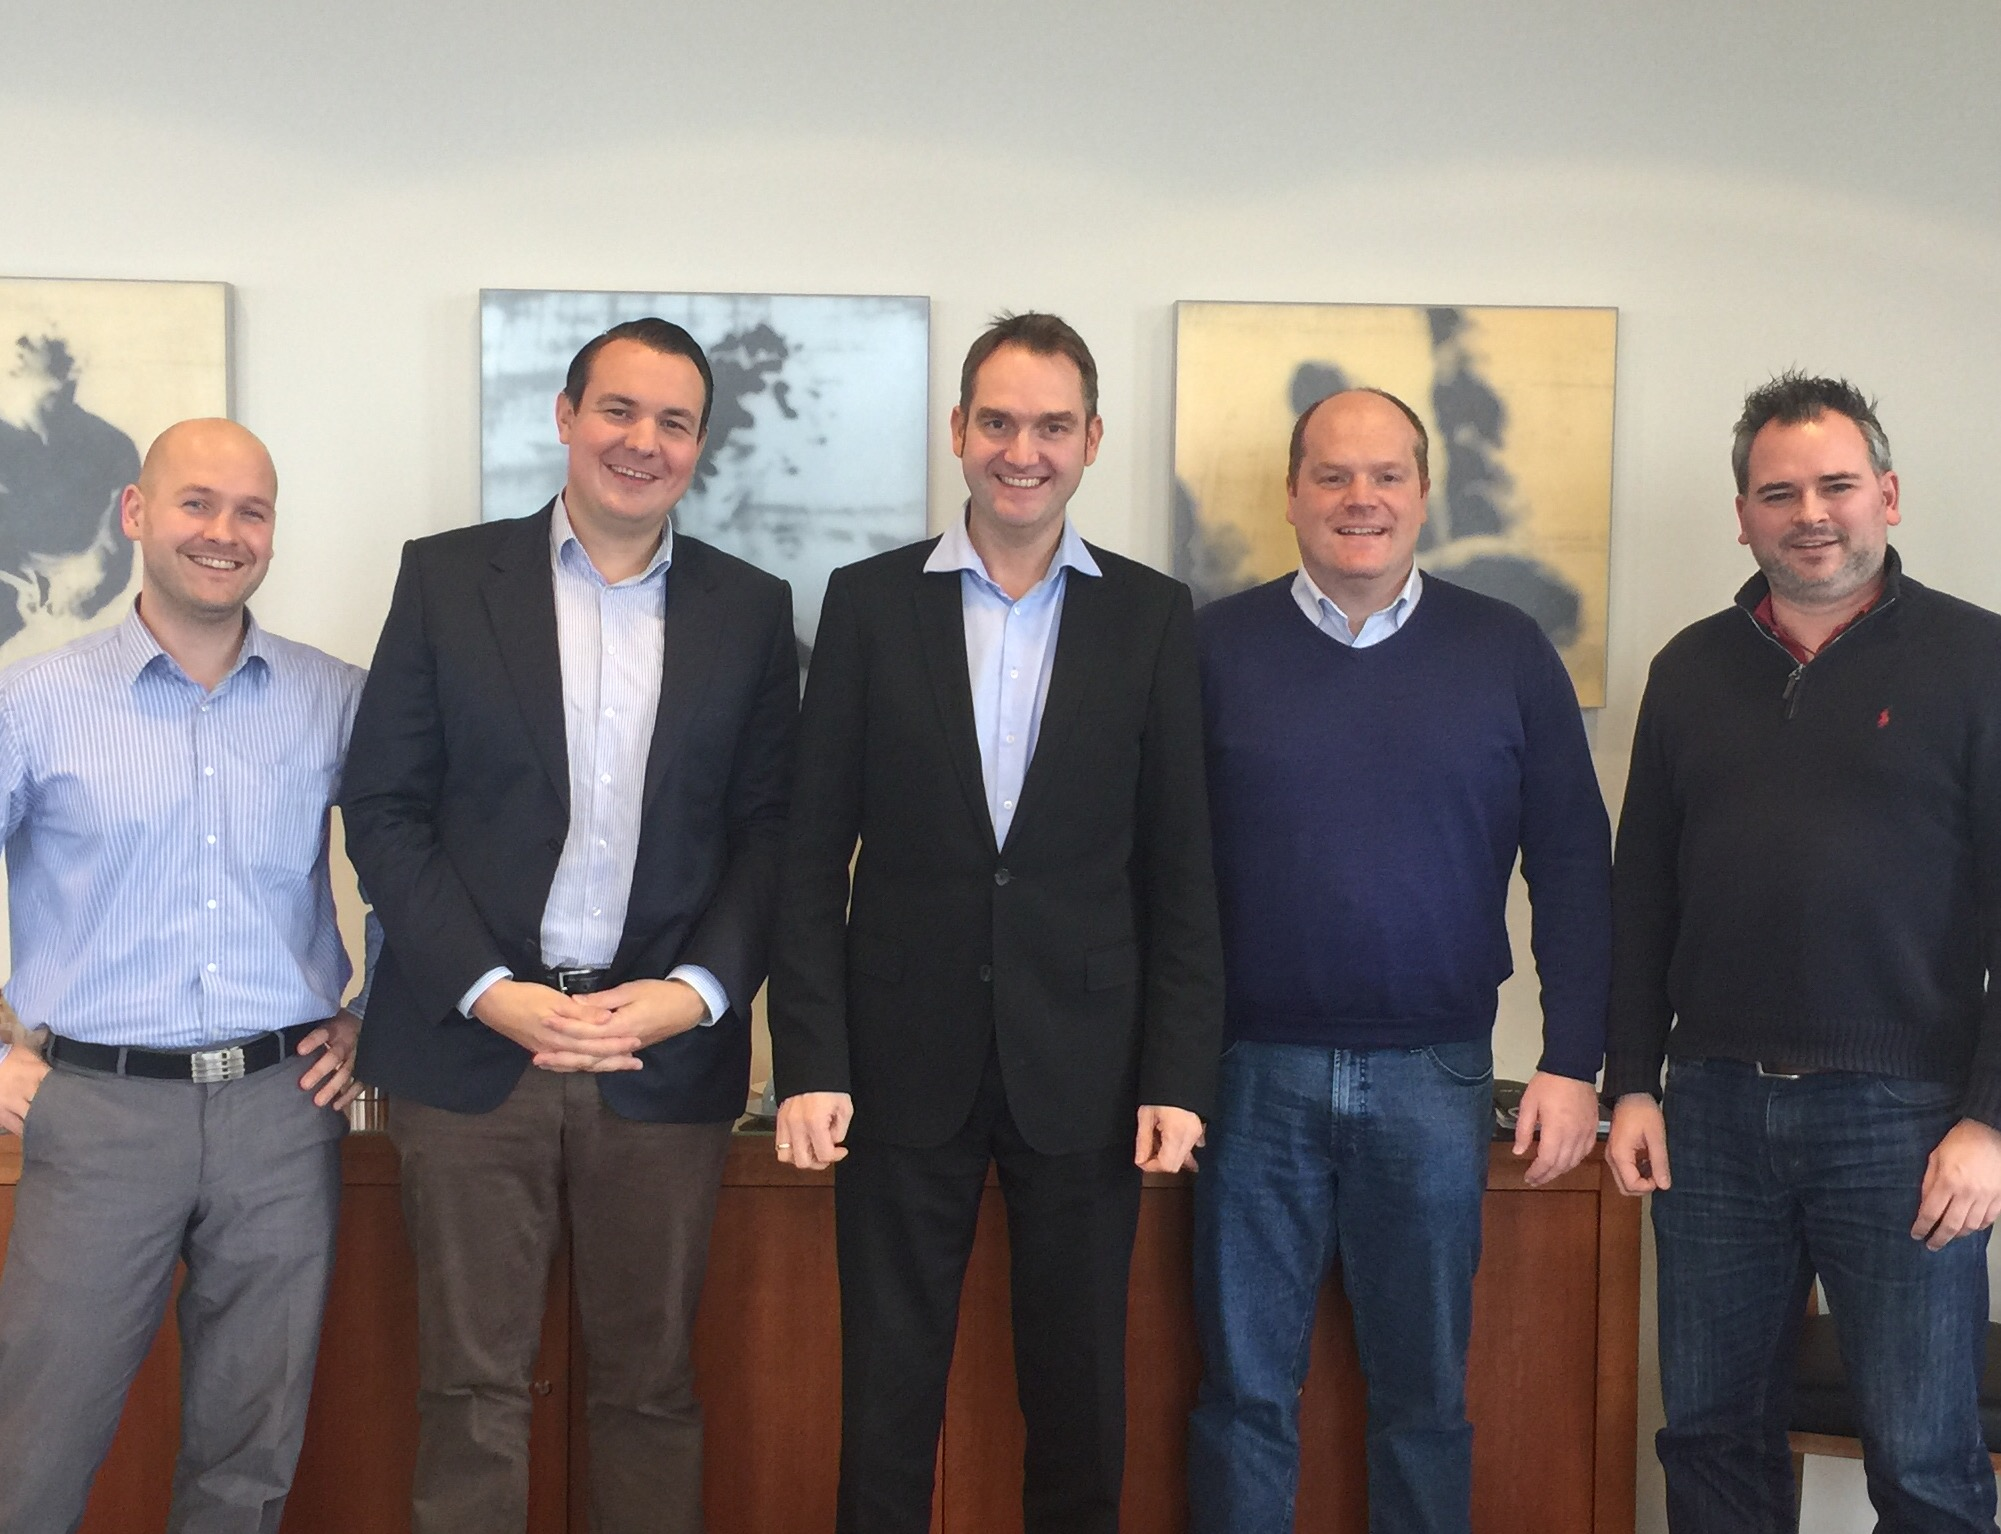 vlnr: Rayk Reitenbach, ibb Beteiligungsgesellschaft, Florian Nöll, Oliver Grün, Sascha Schubert, Martin Müller